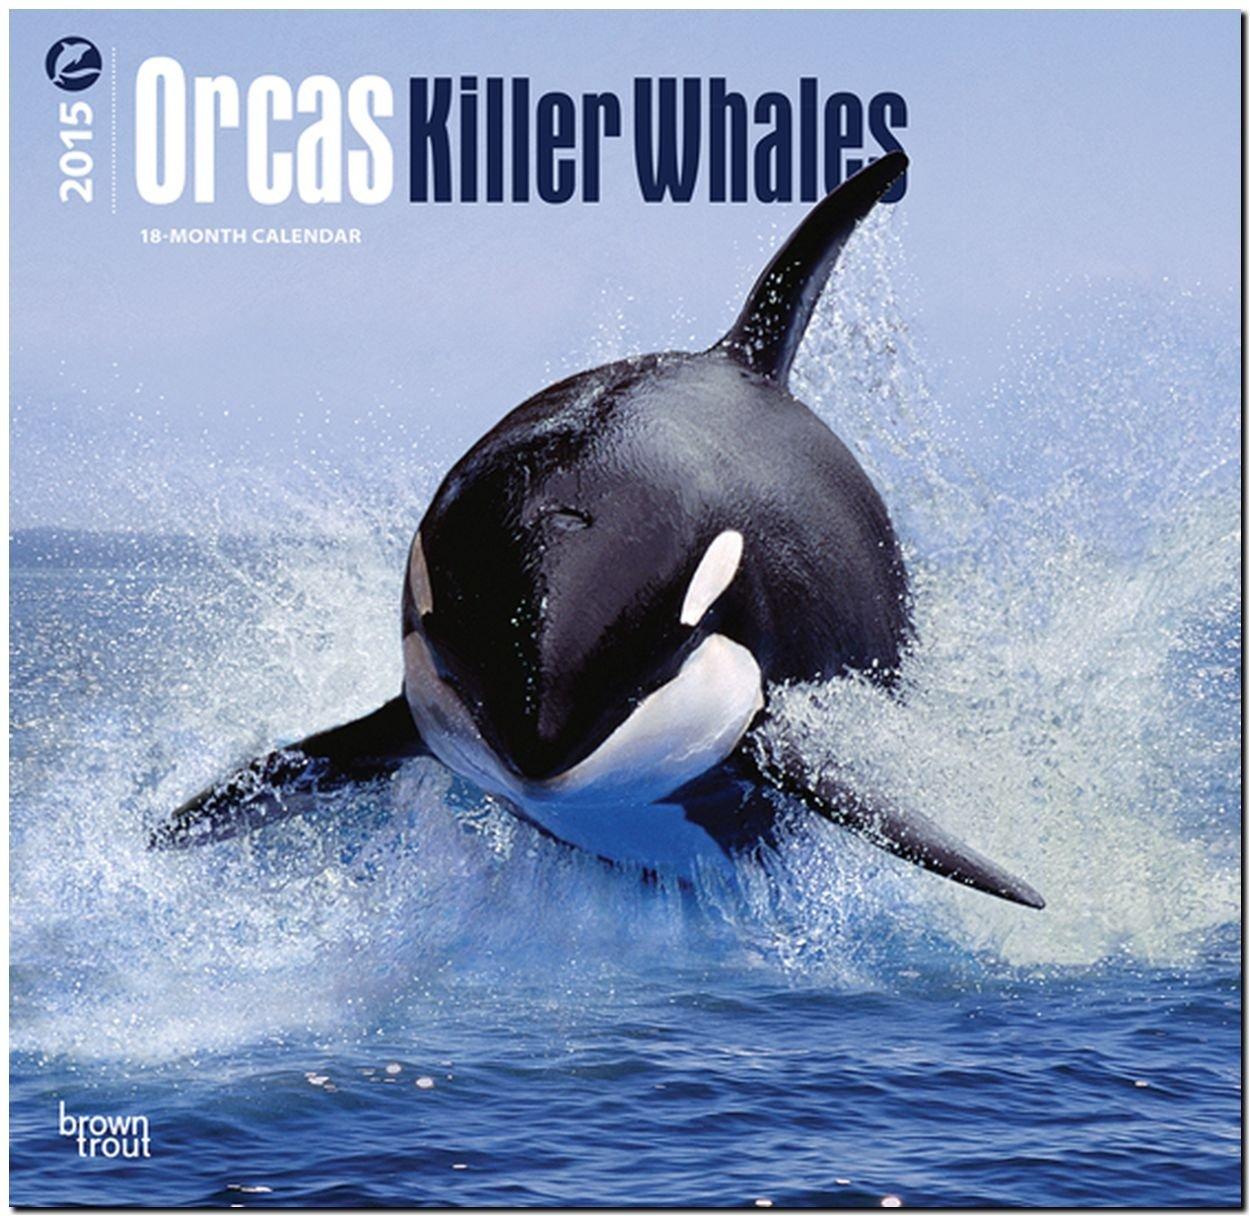 Orcas 2015 - Killerwale